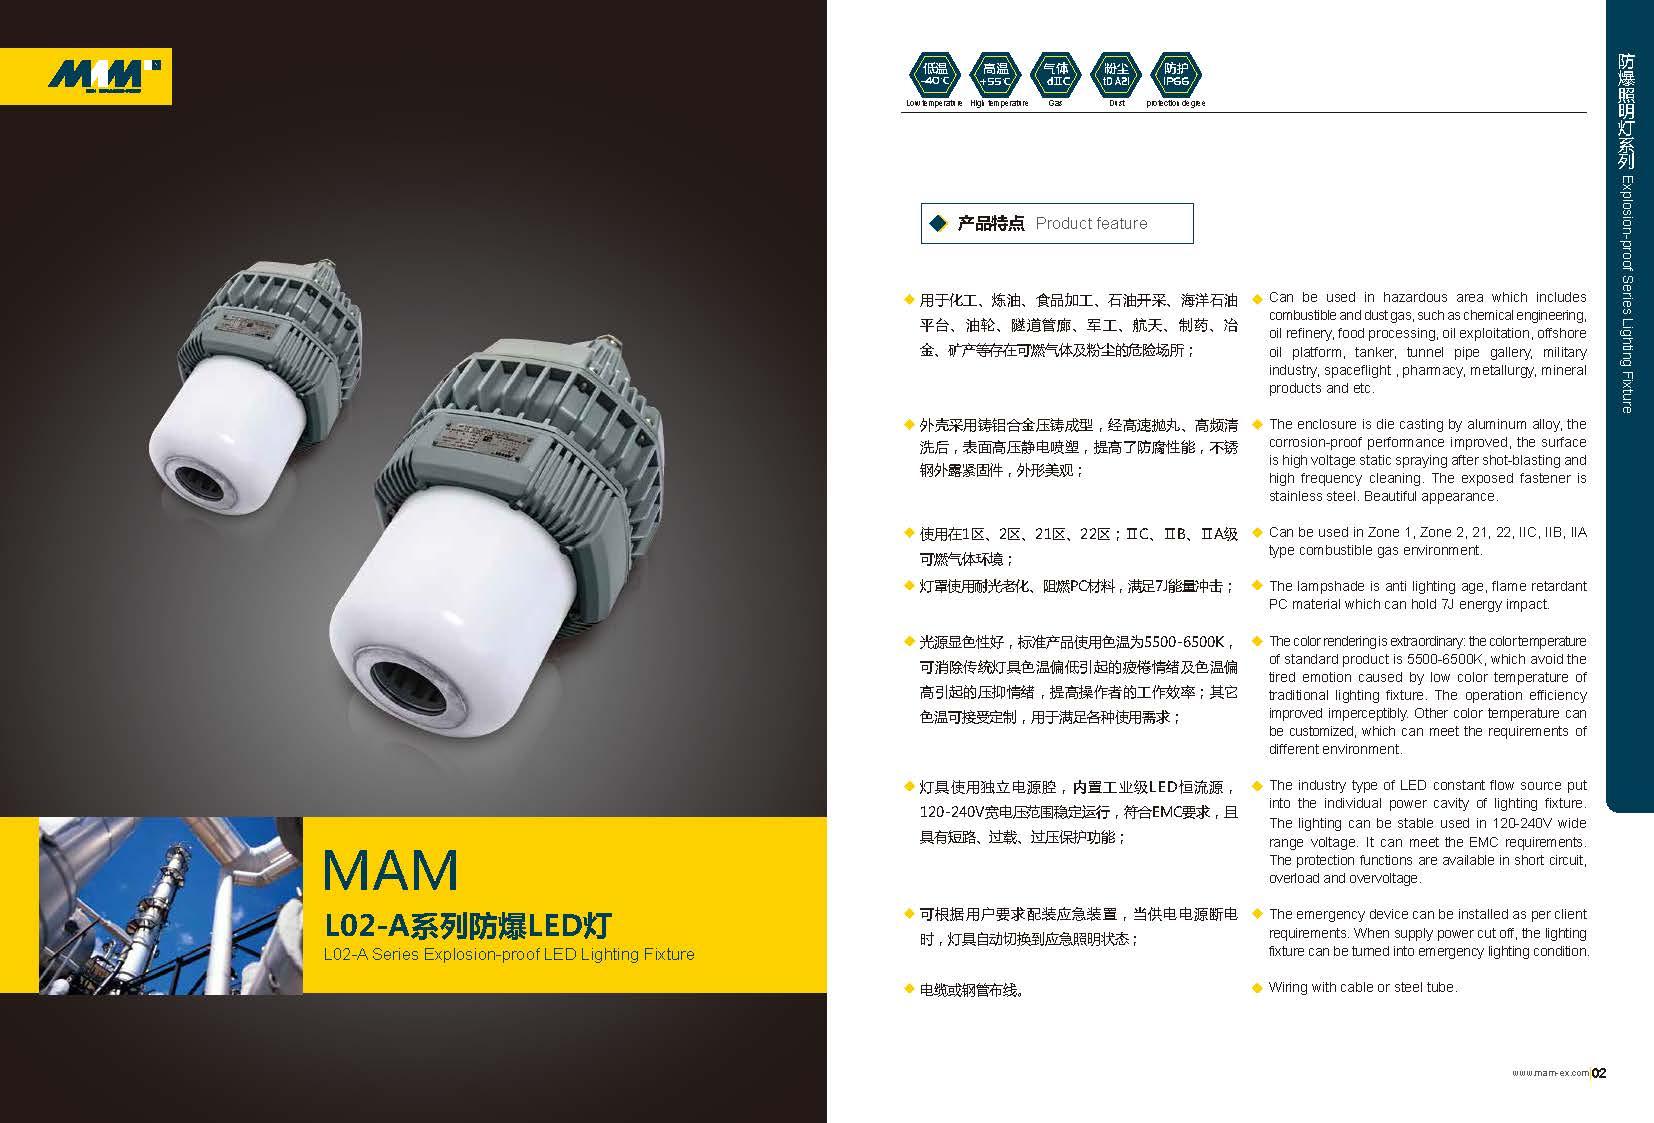 Explosion-proof LED Lighting Fixture, MAML02-A Series